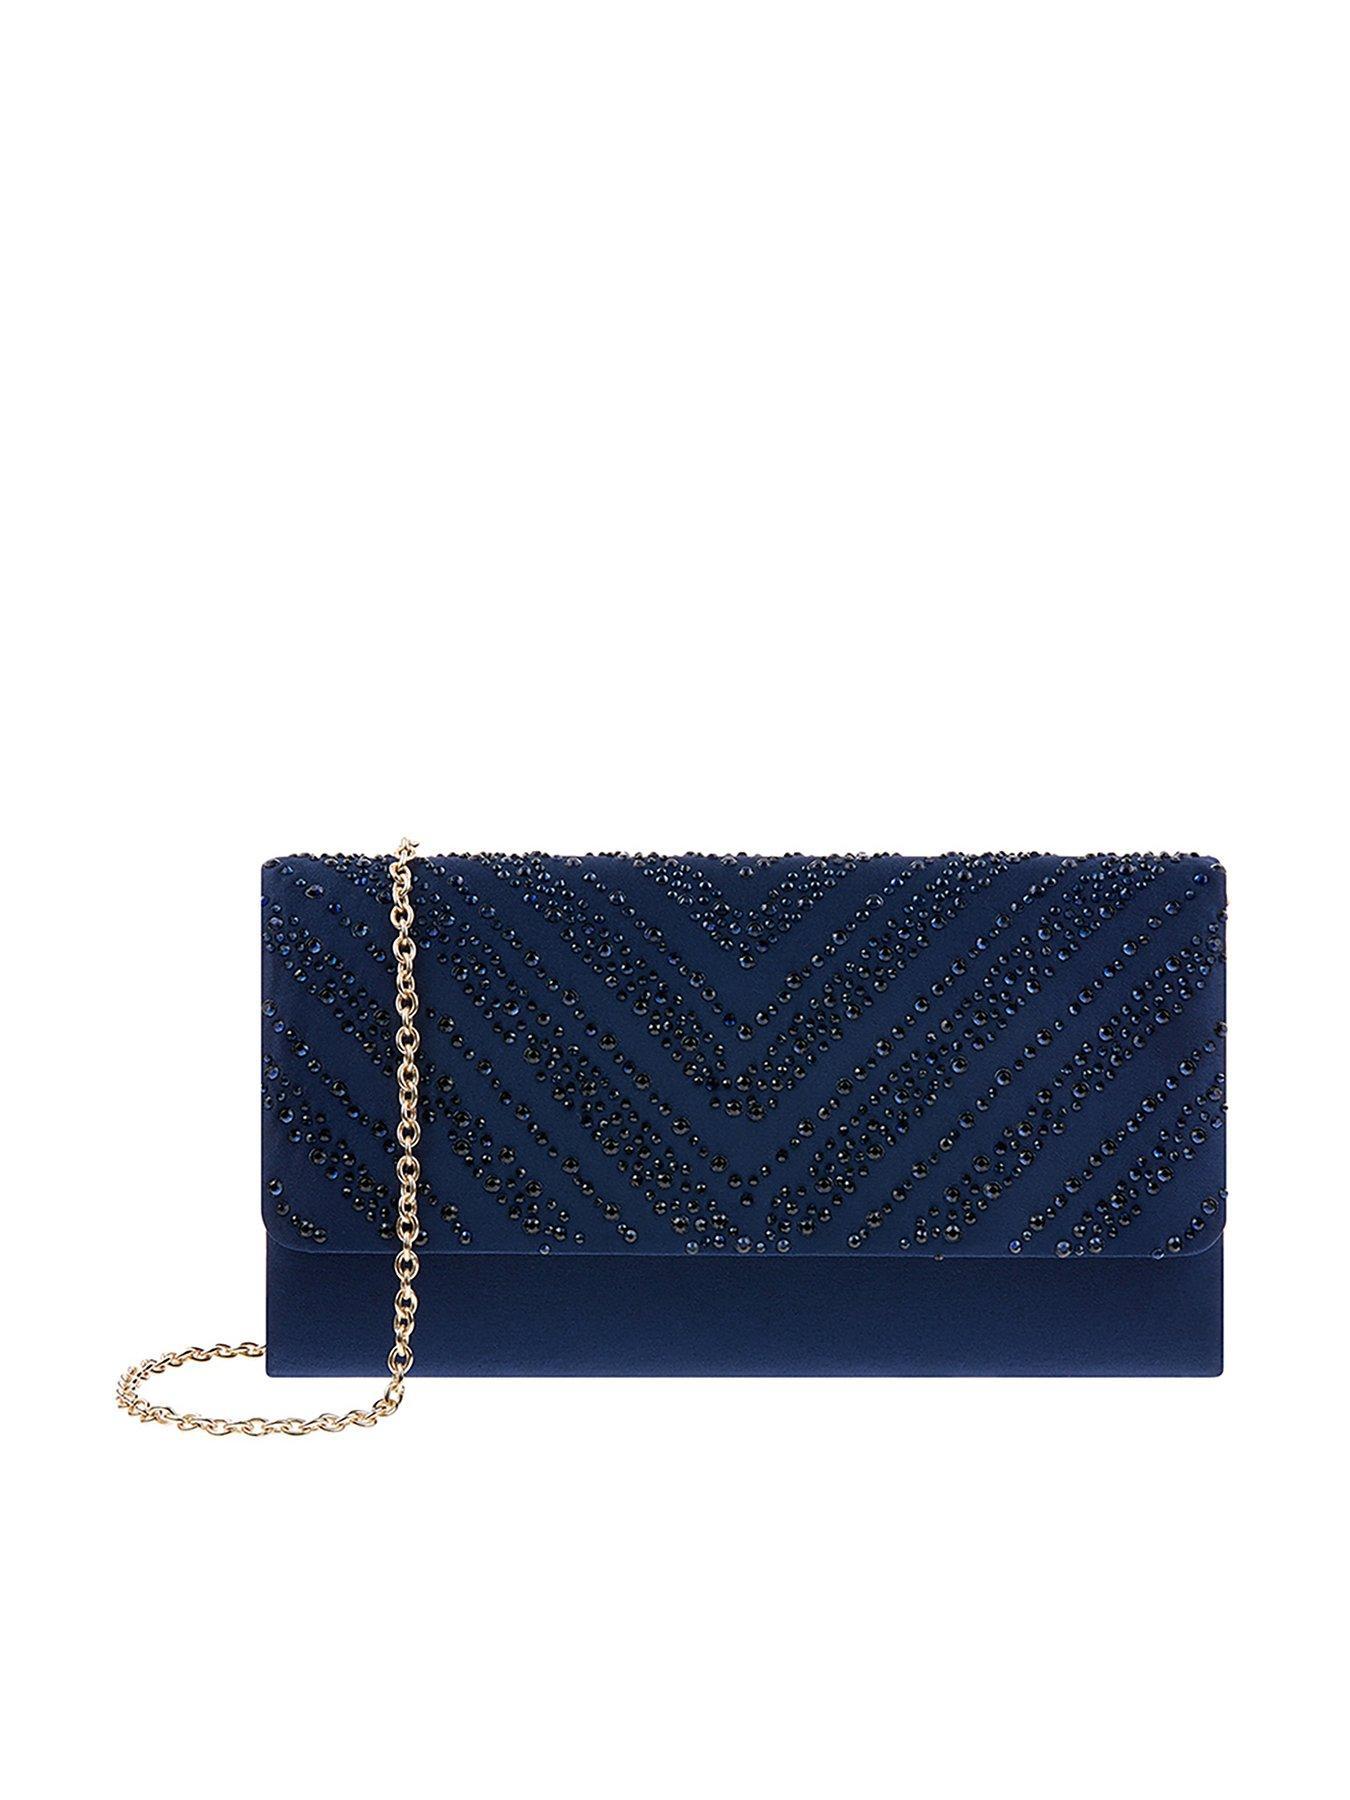 Handbags | Womens Bags | Purses |